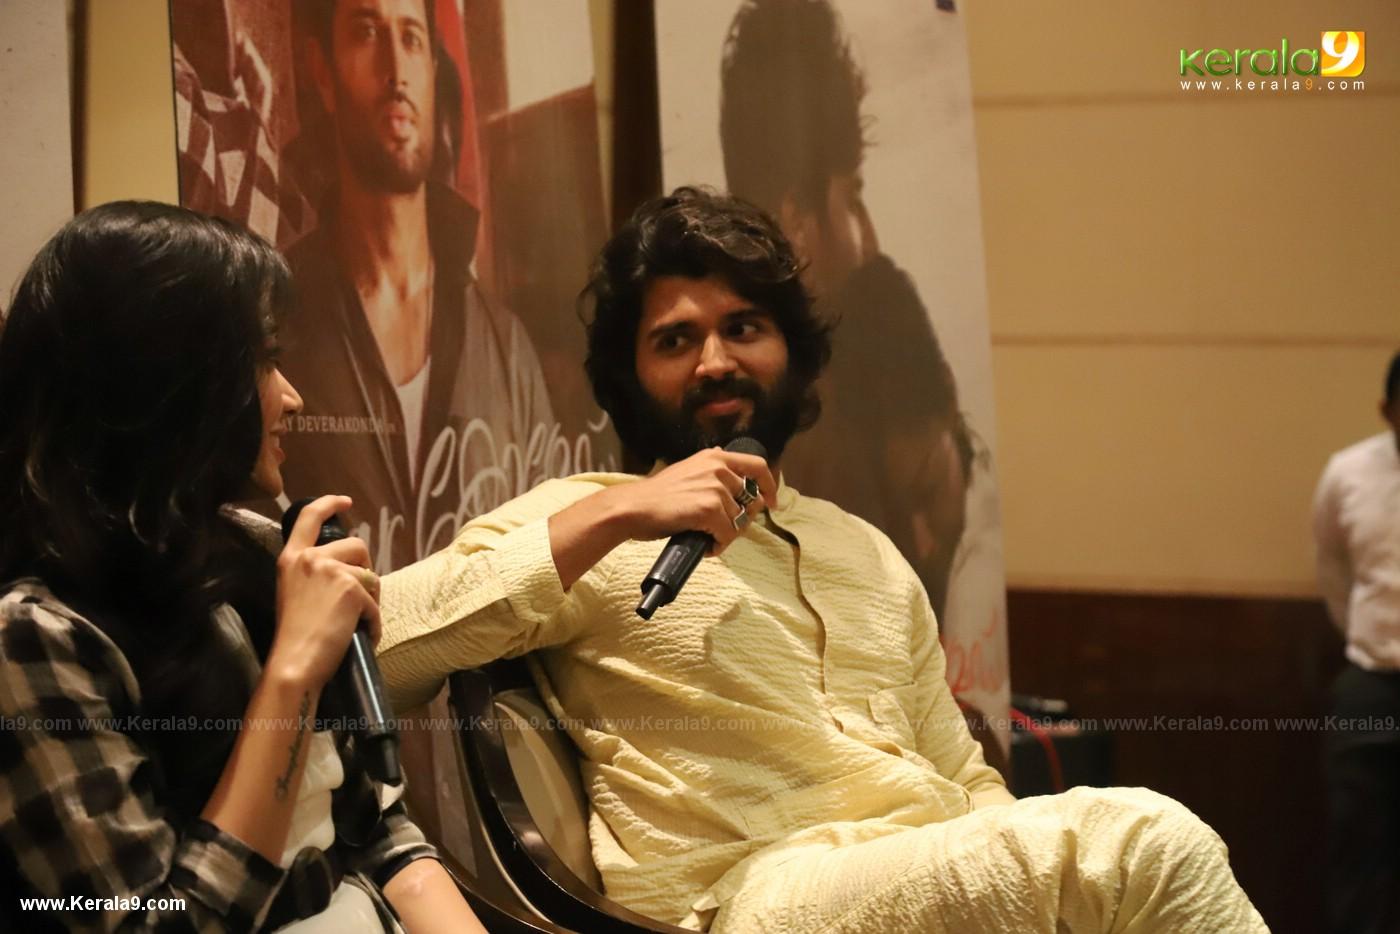 Vijay Devarakonda at Dear Comrade movie premotion kerala kochi photos 001 - Kerala9.com